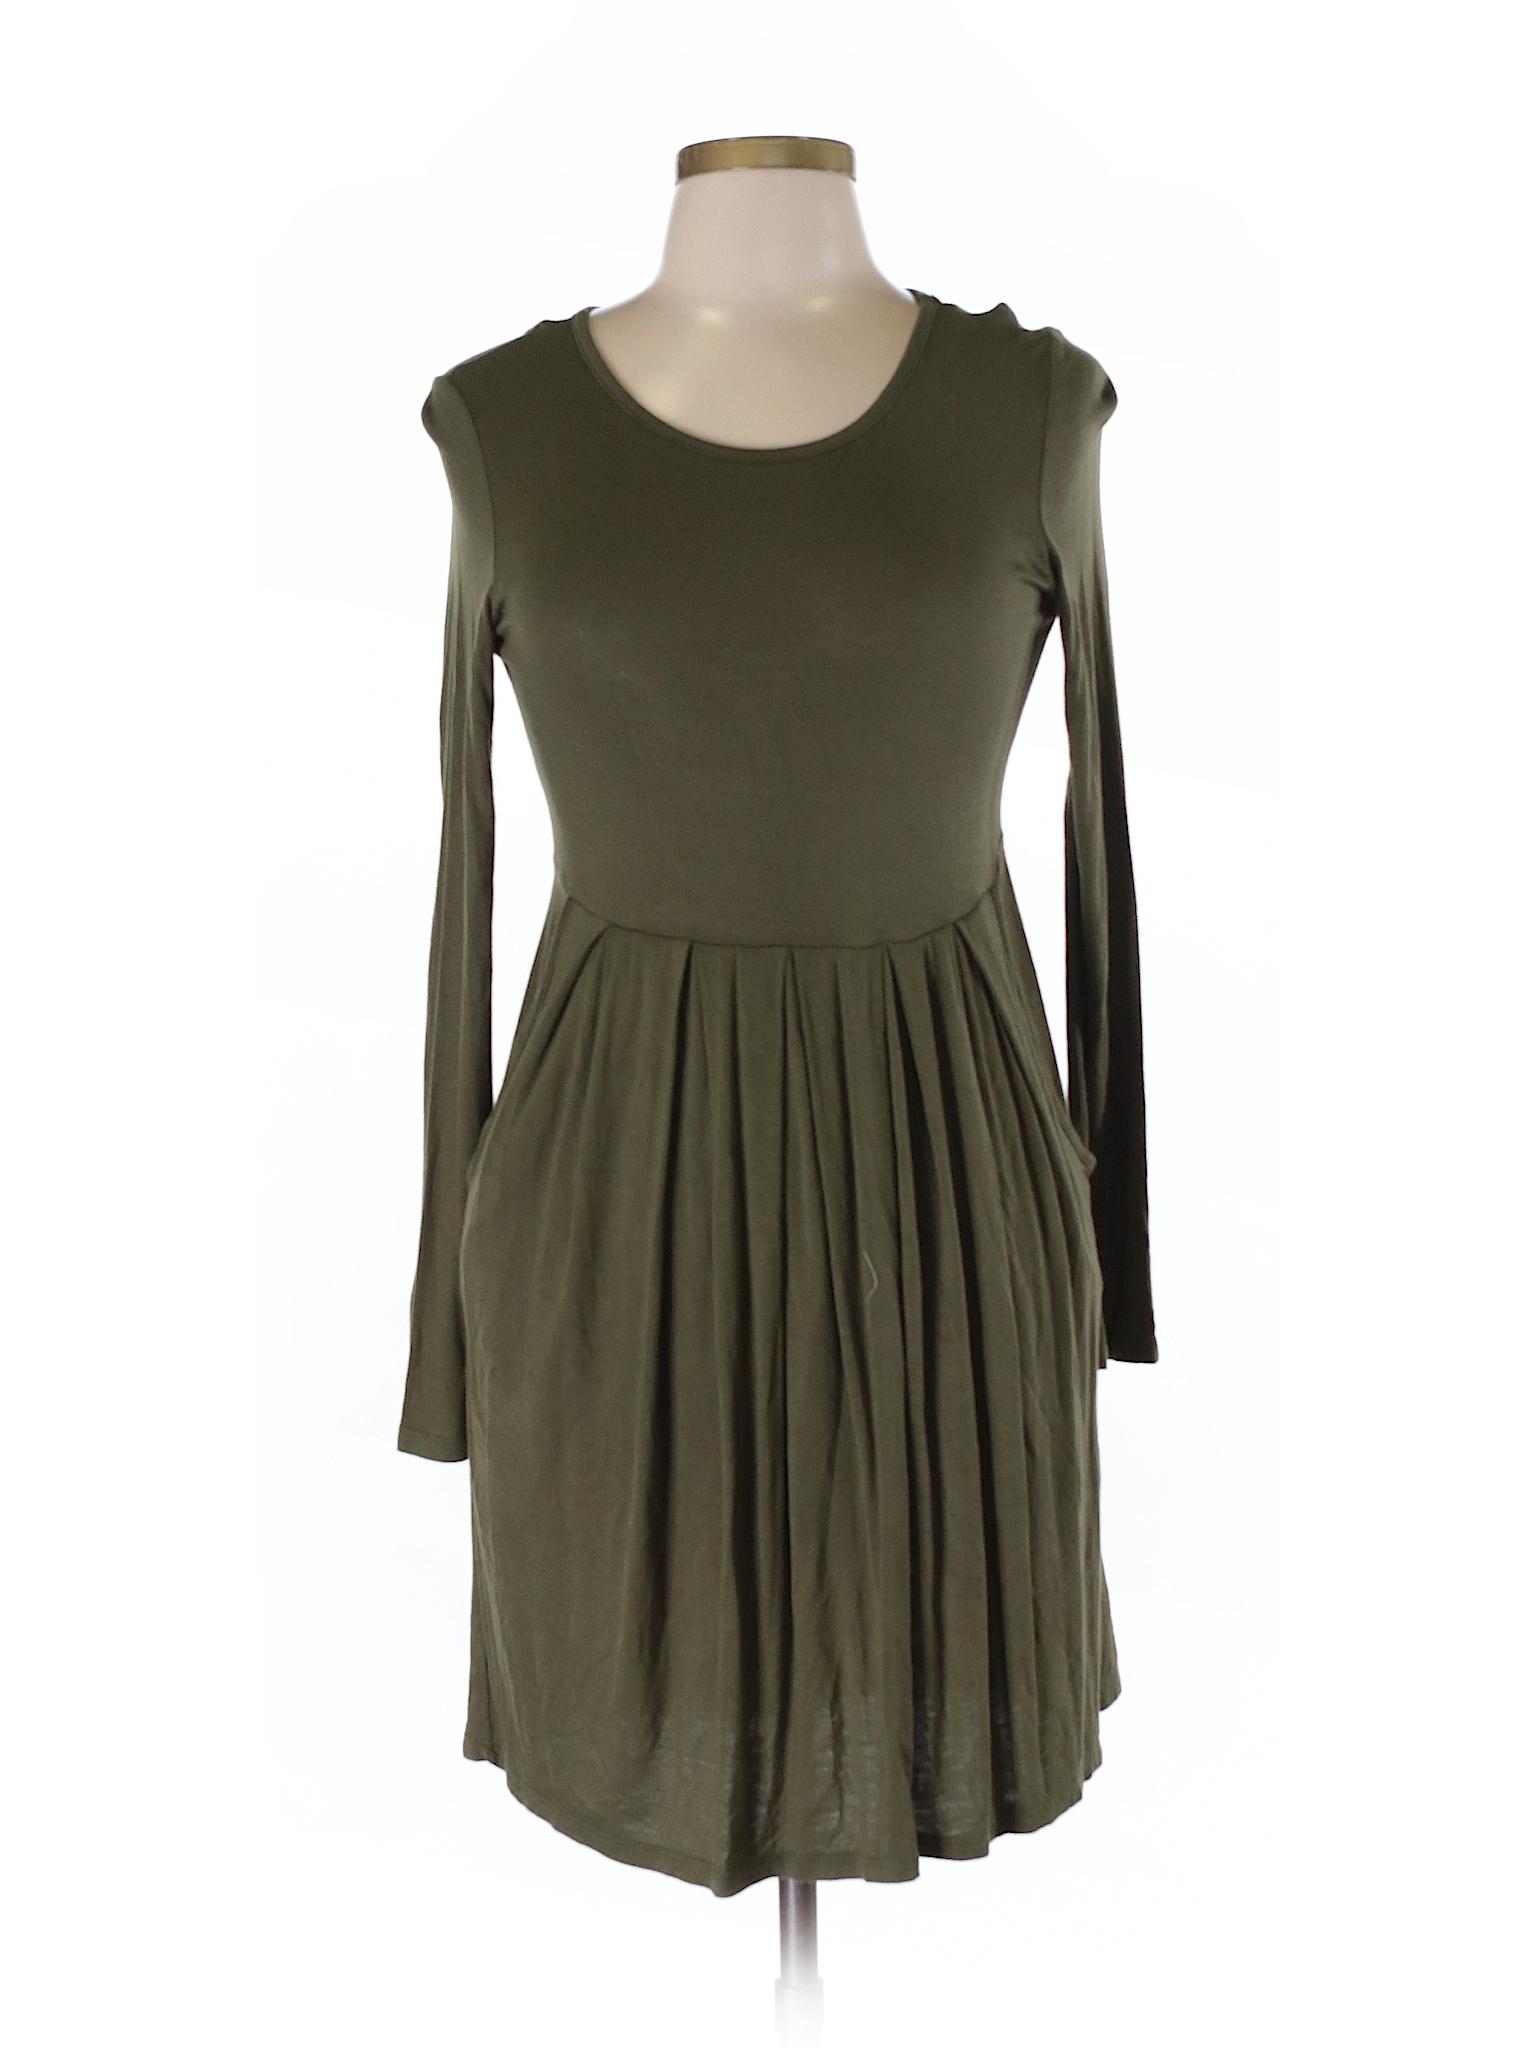 12pm winter Casual Ami Dress by Boutique Mon Tw5qR8nz